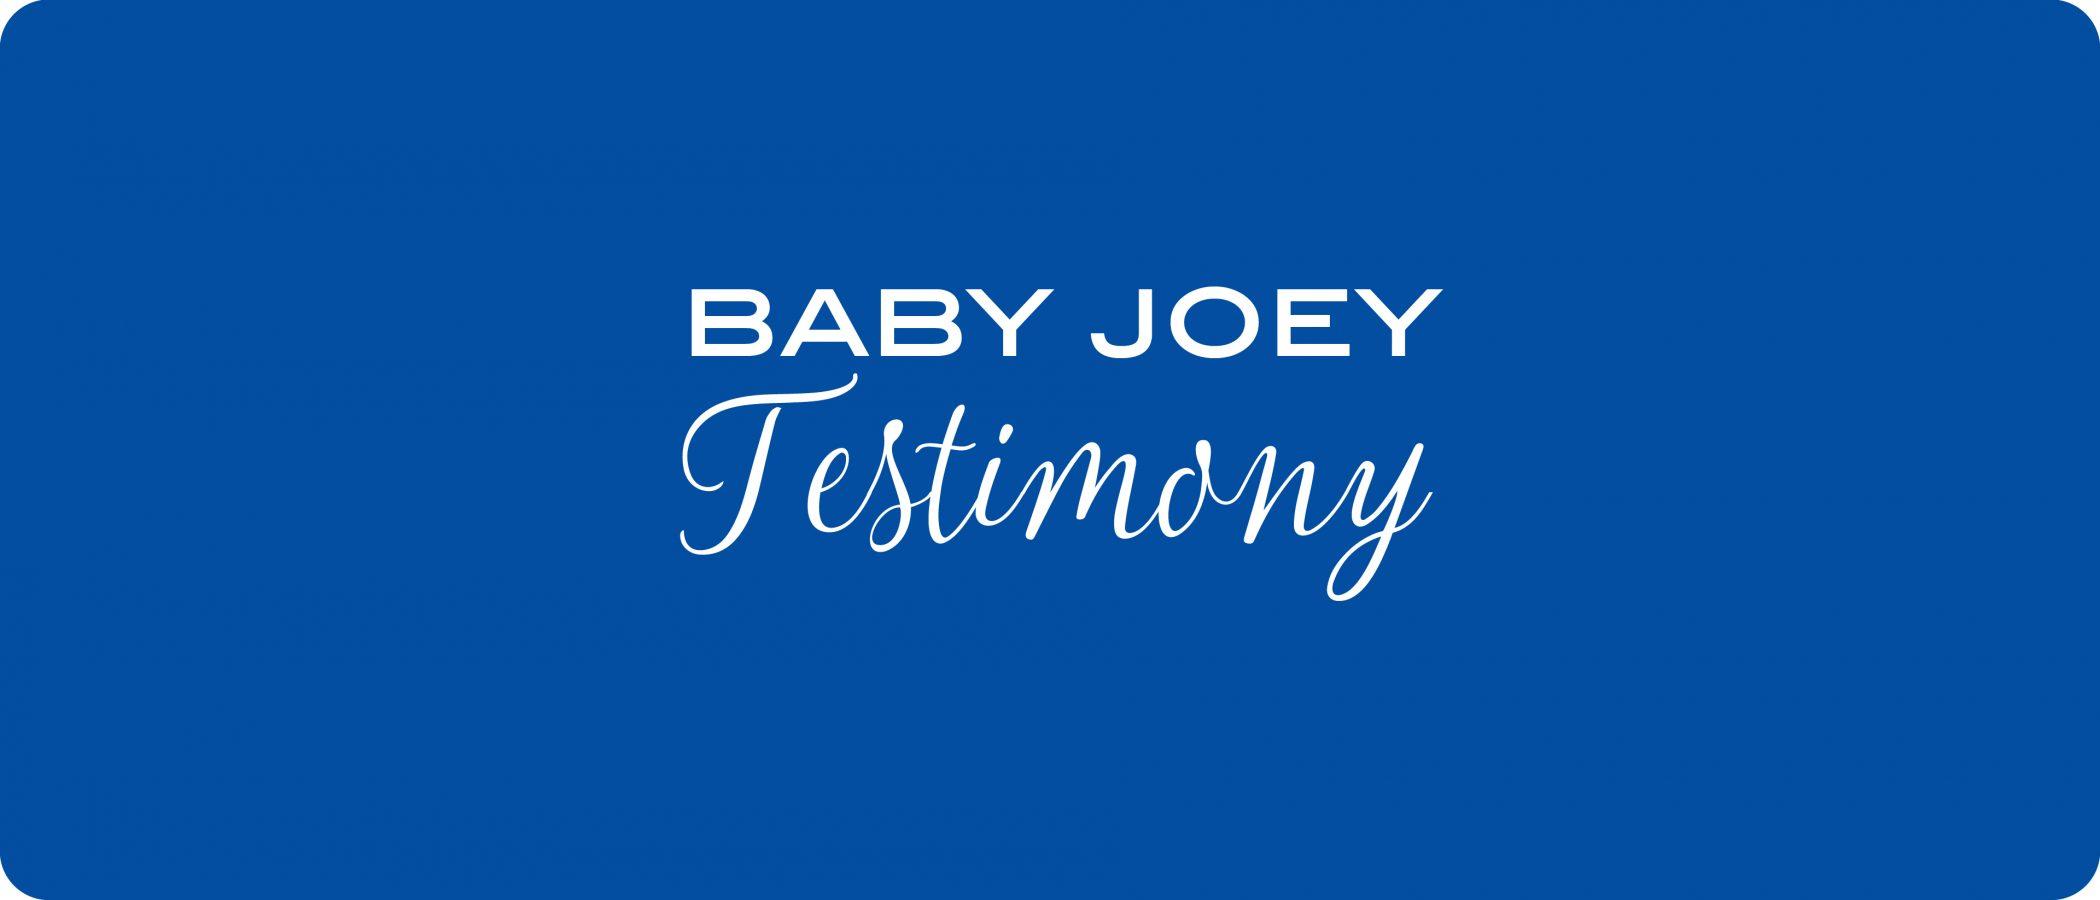 testimony-11brd-dq2021-web-banner2x-100